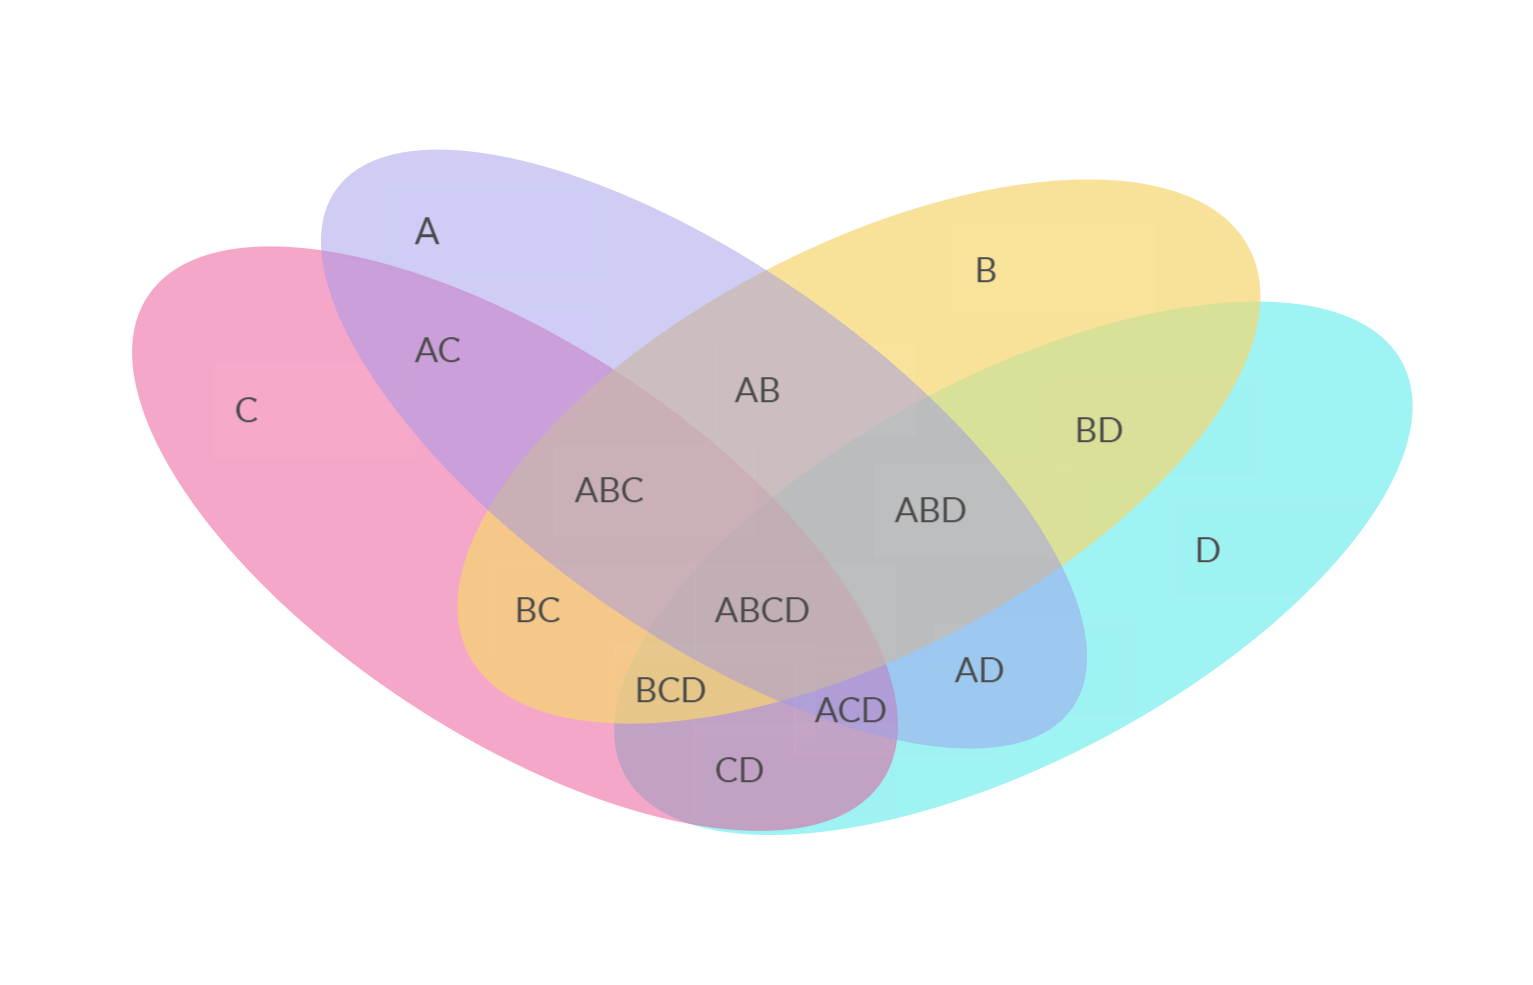 Venn Diagram Template With 4